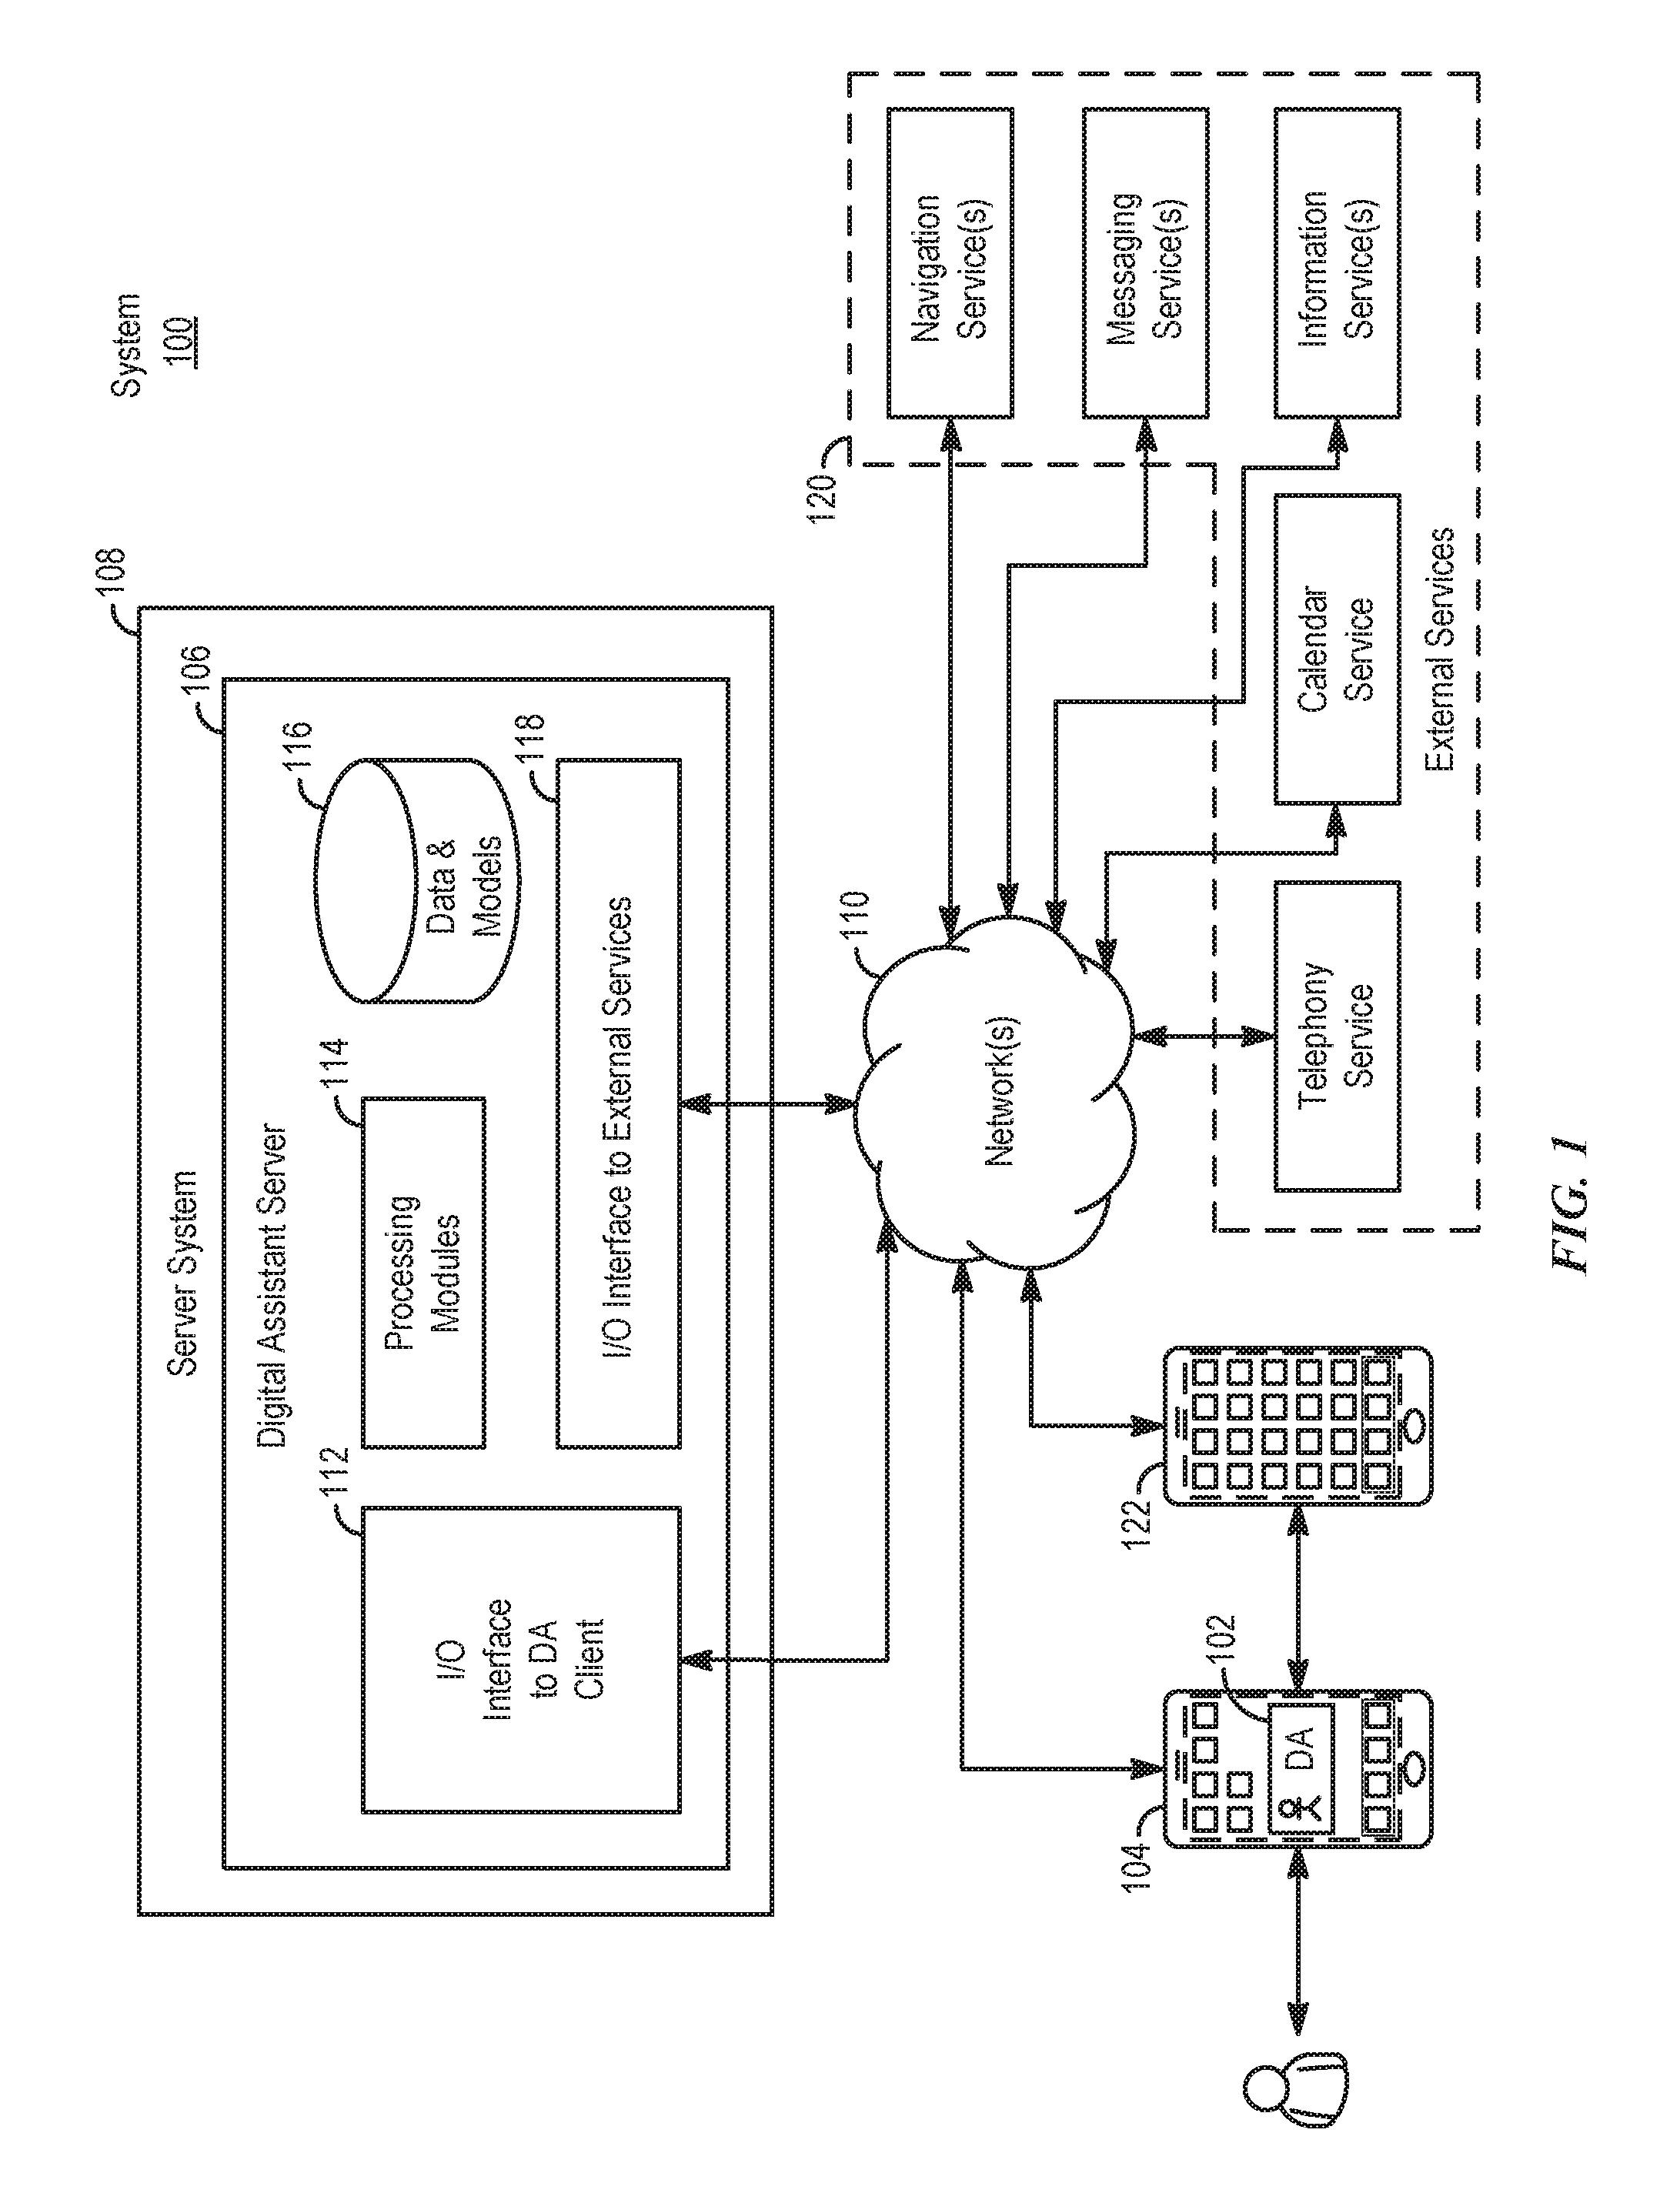 US10249300B2 - Intelligent list reading - Google Patents on